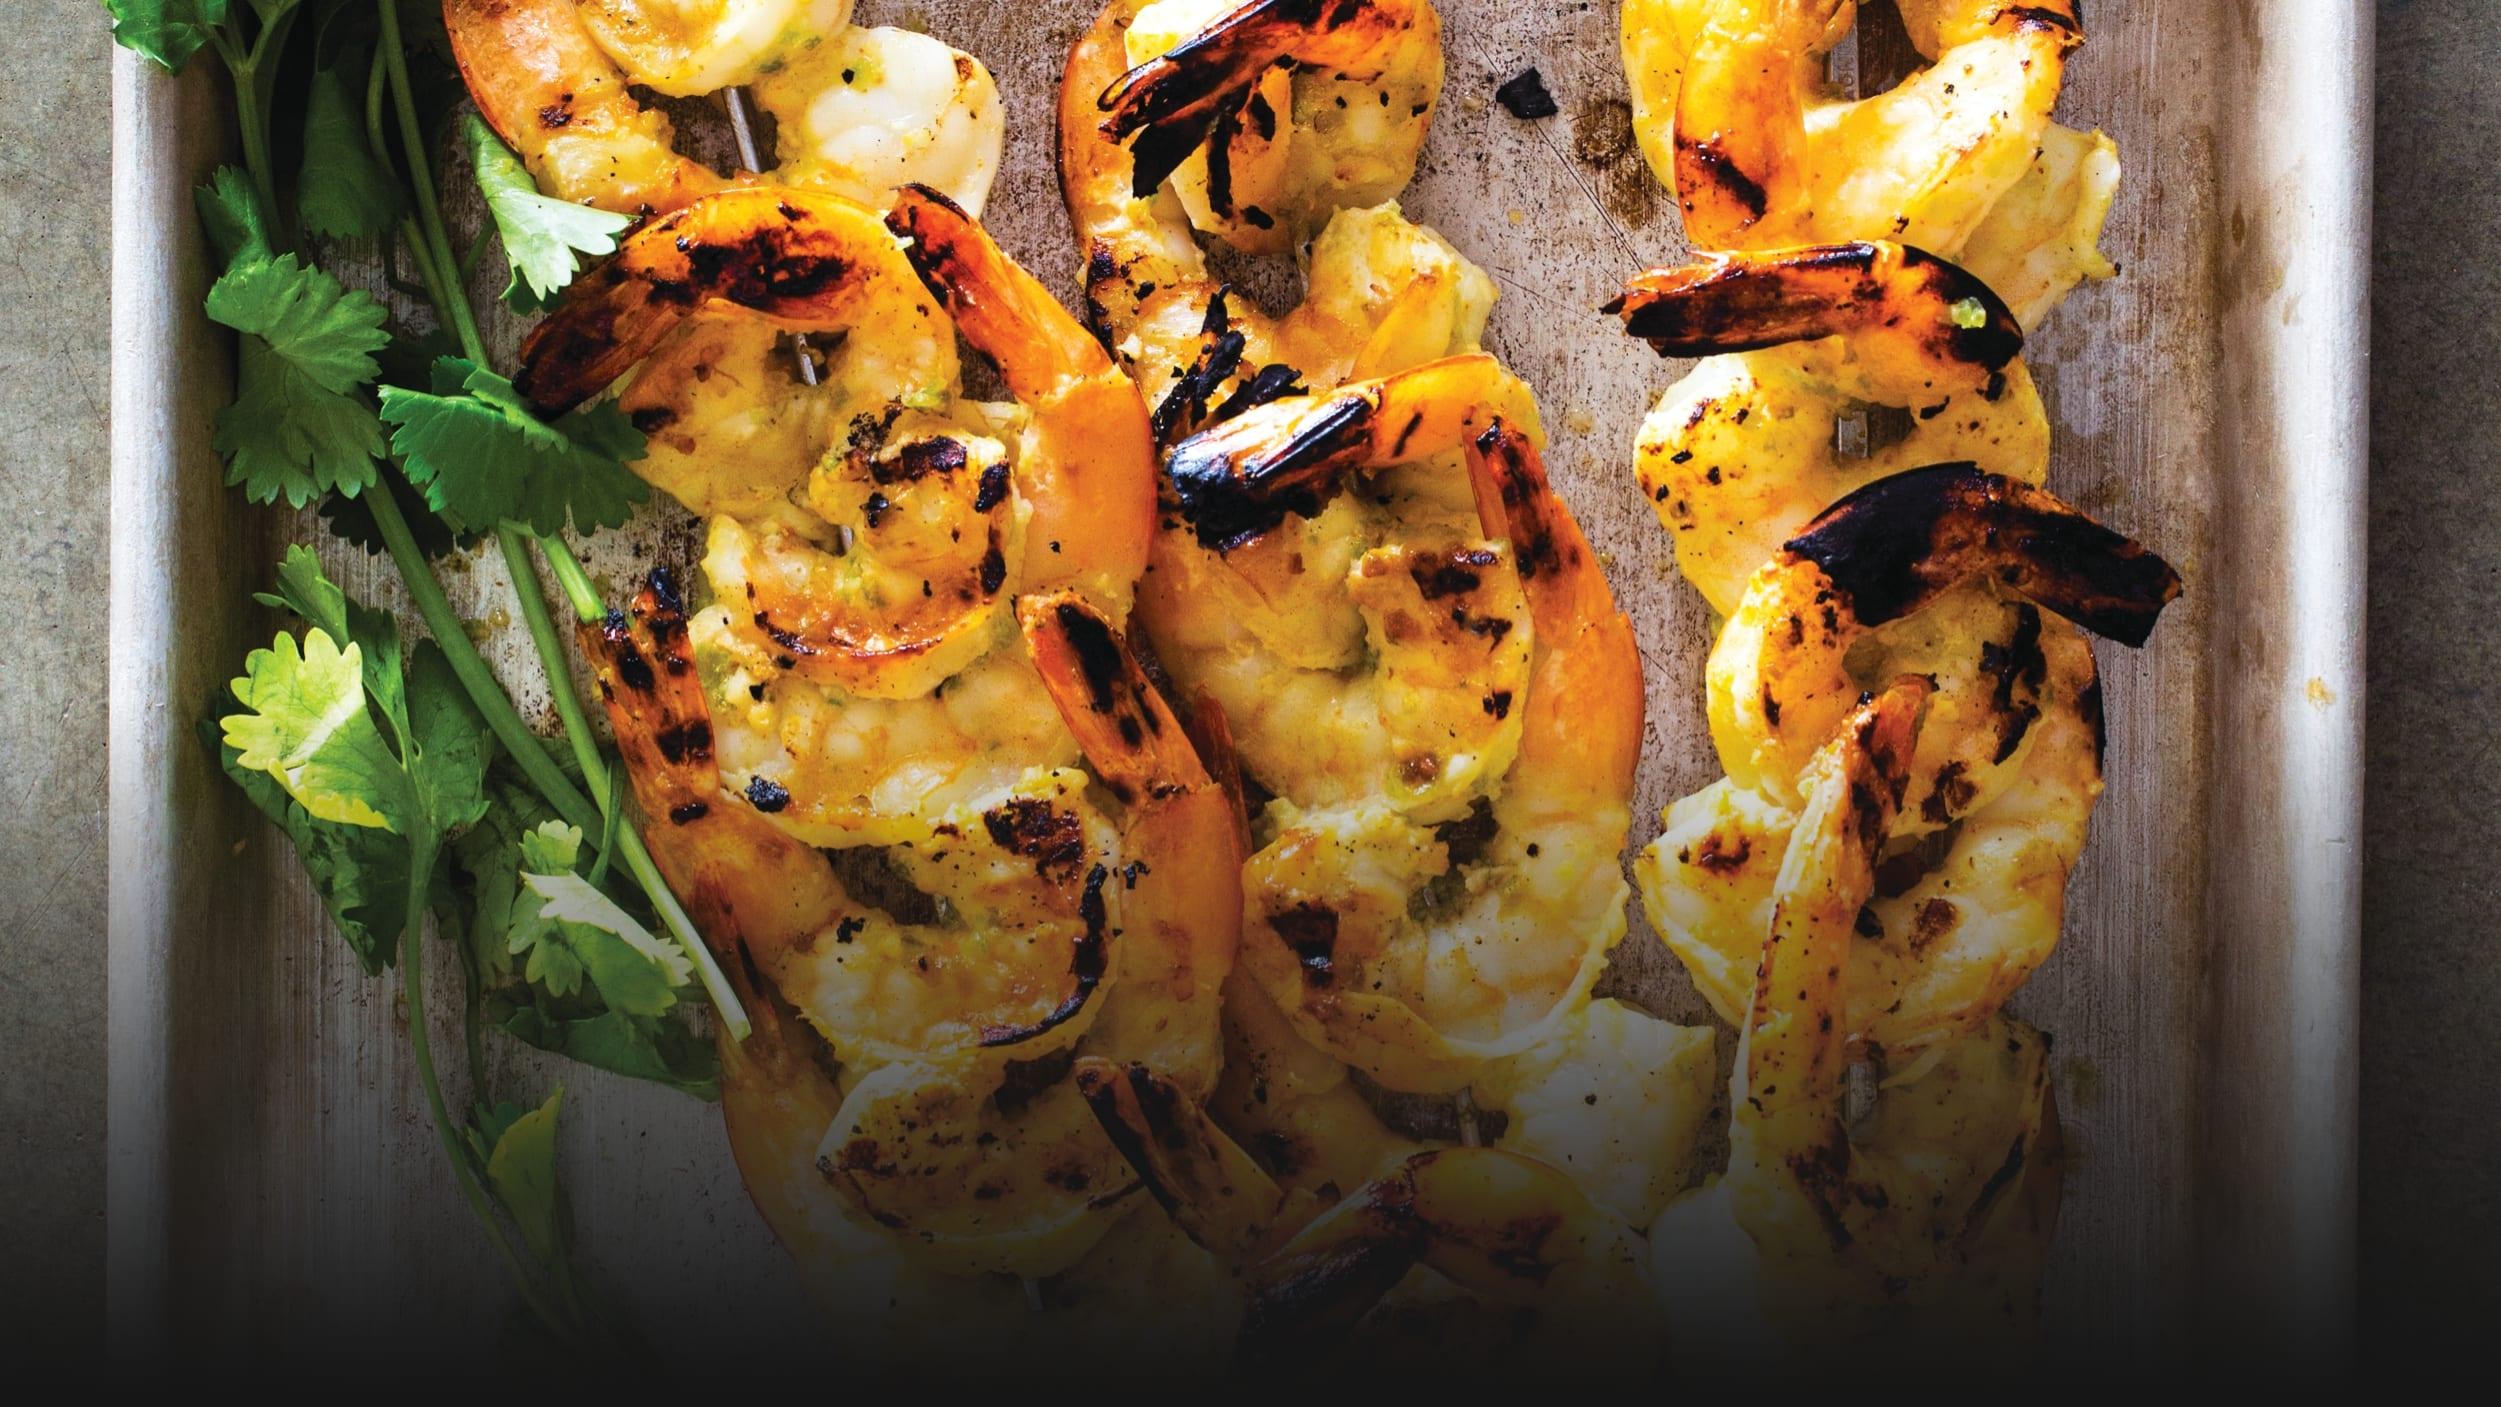 Your Grilled Shrimp Should Be Spooning